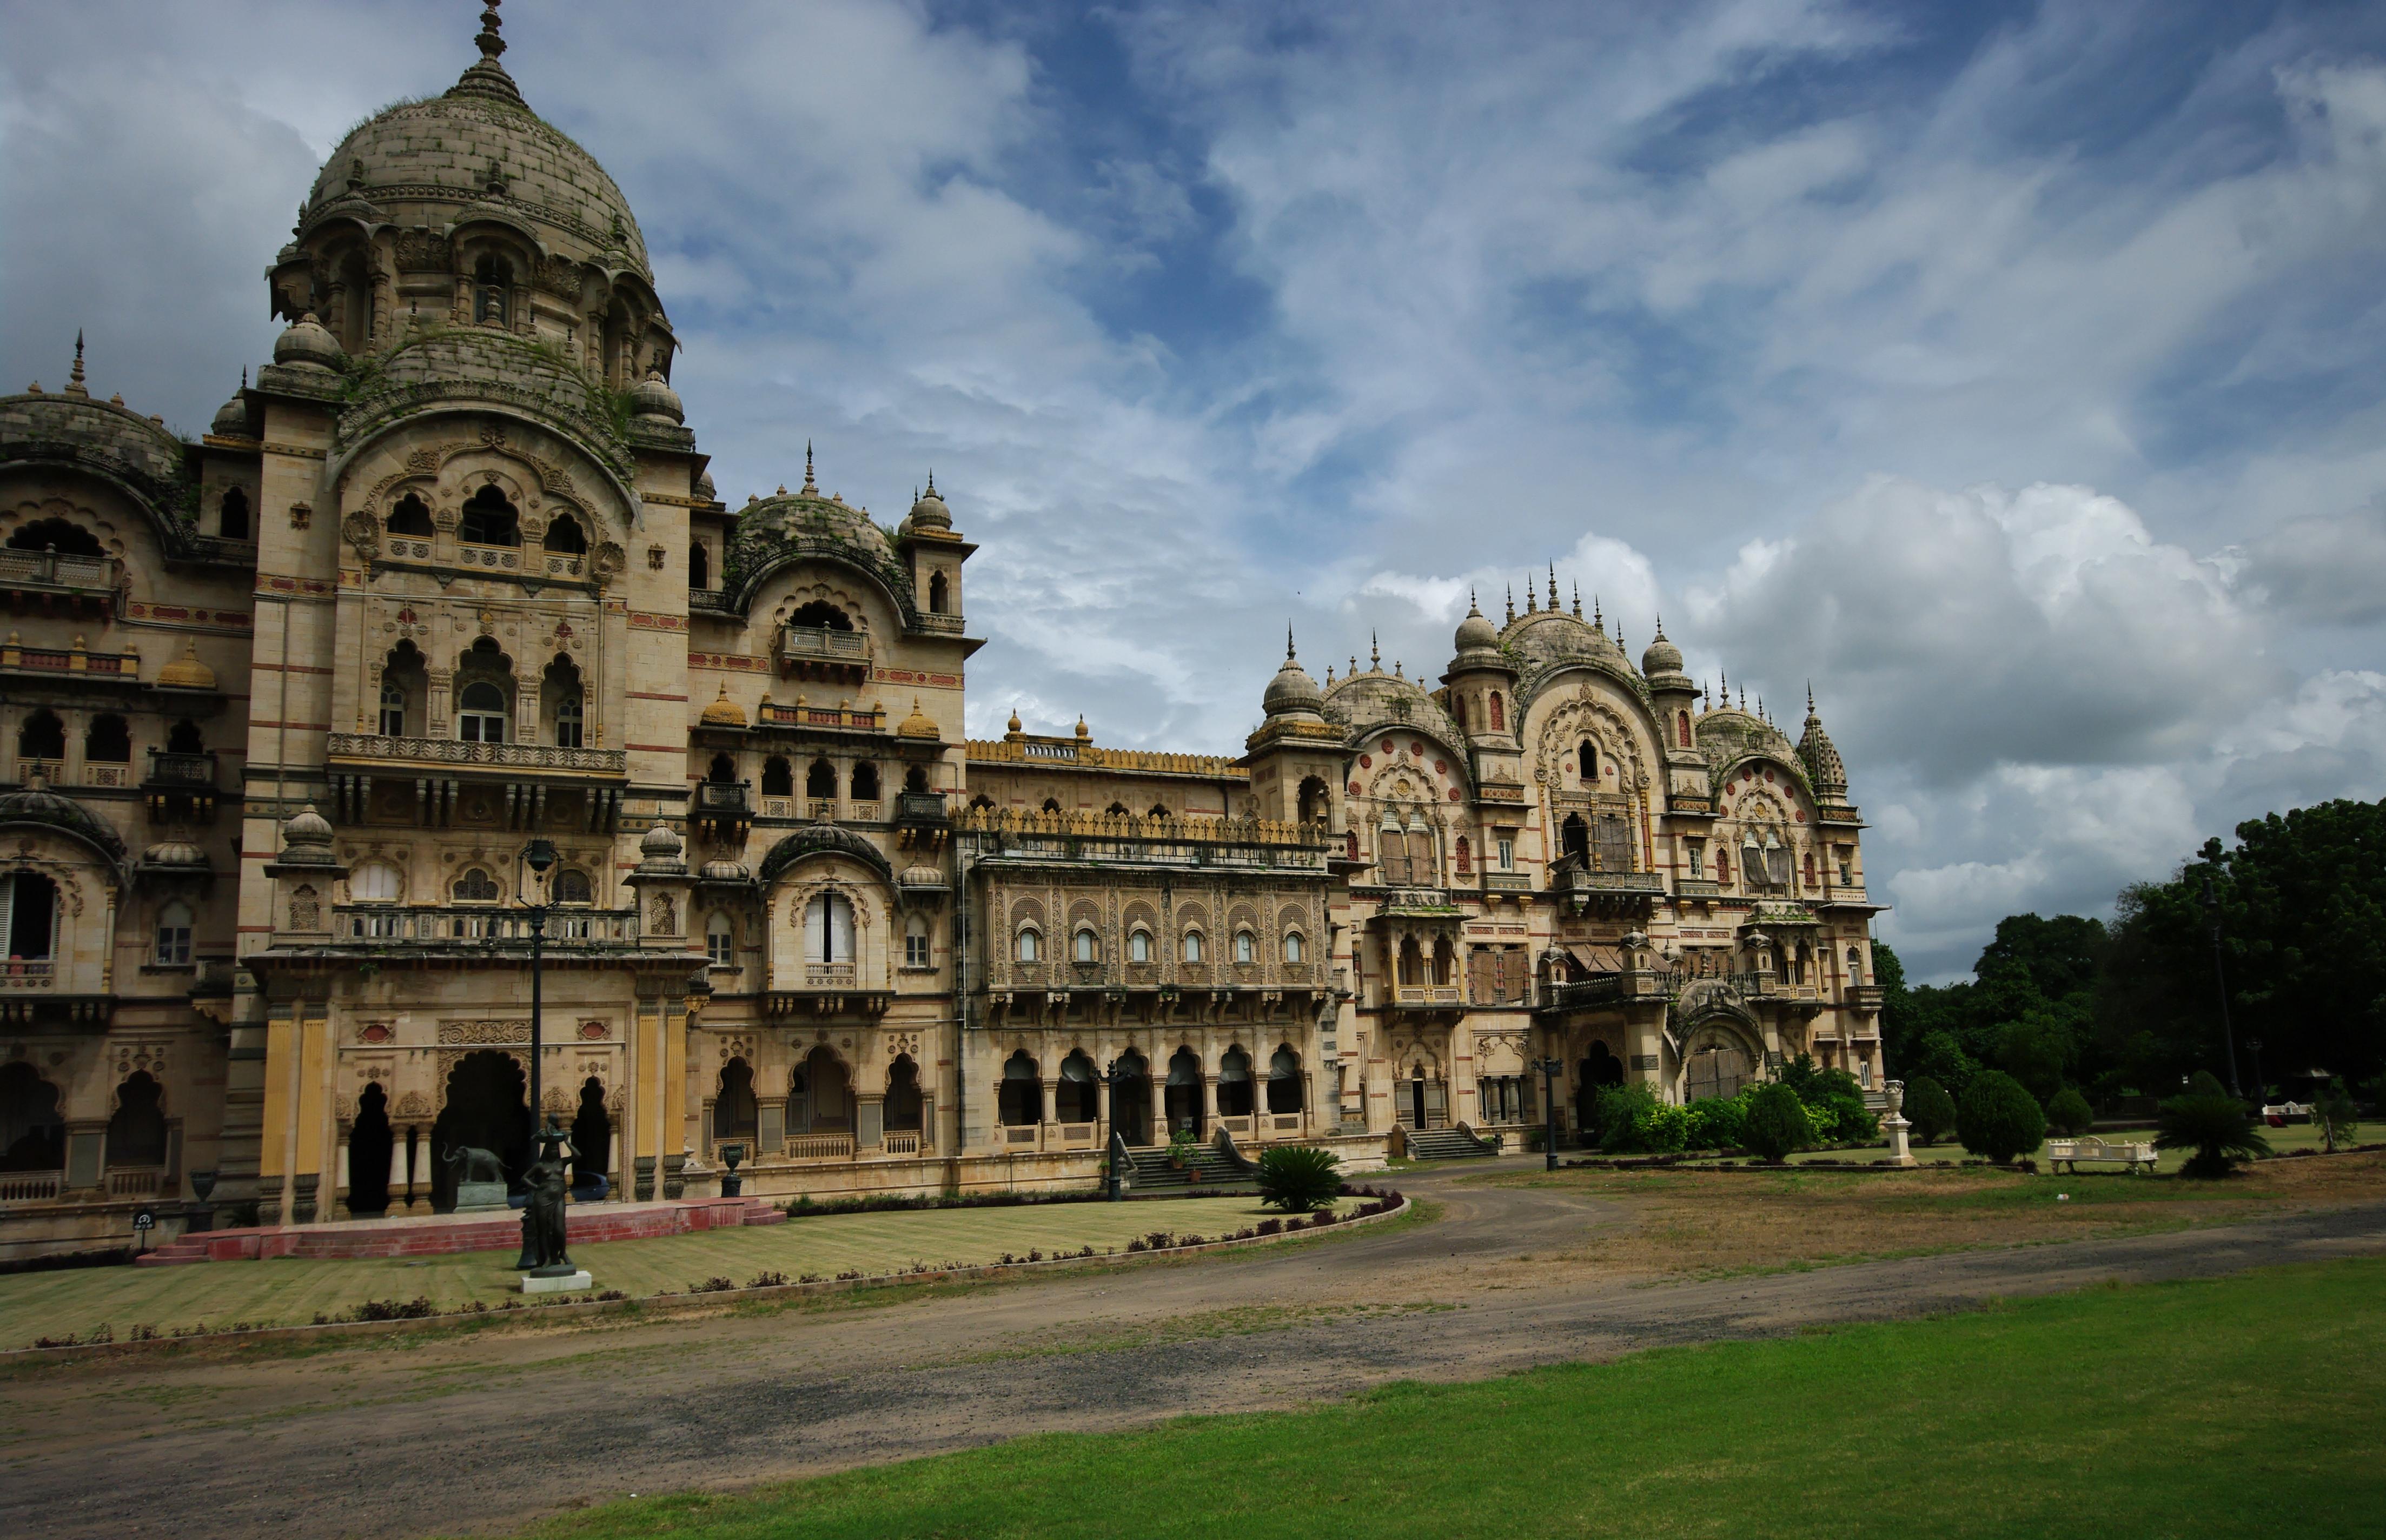 The Lakshmi Vilas Palace Vadodara Entry Fee The Lakshmi